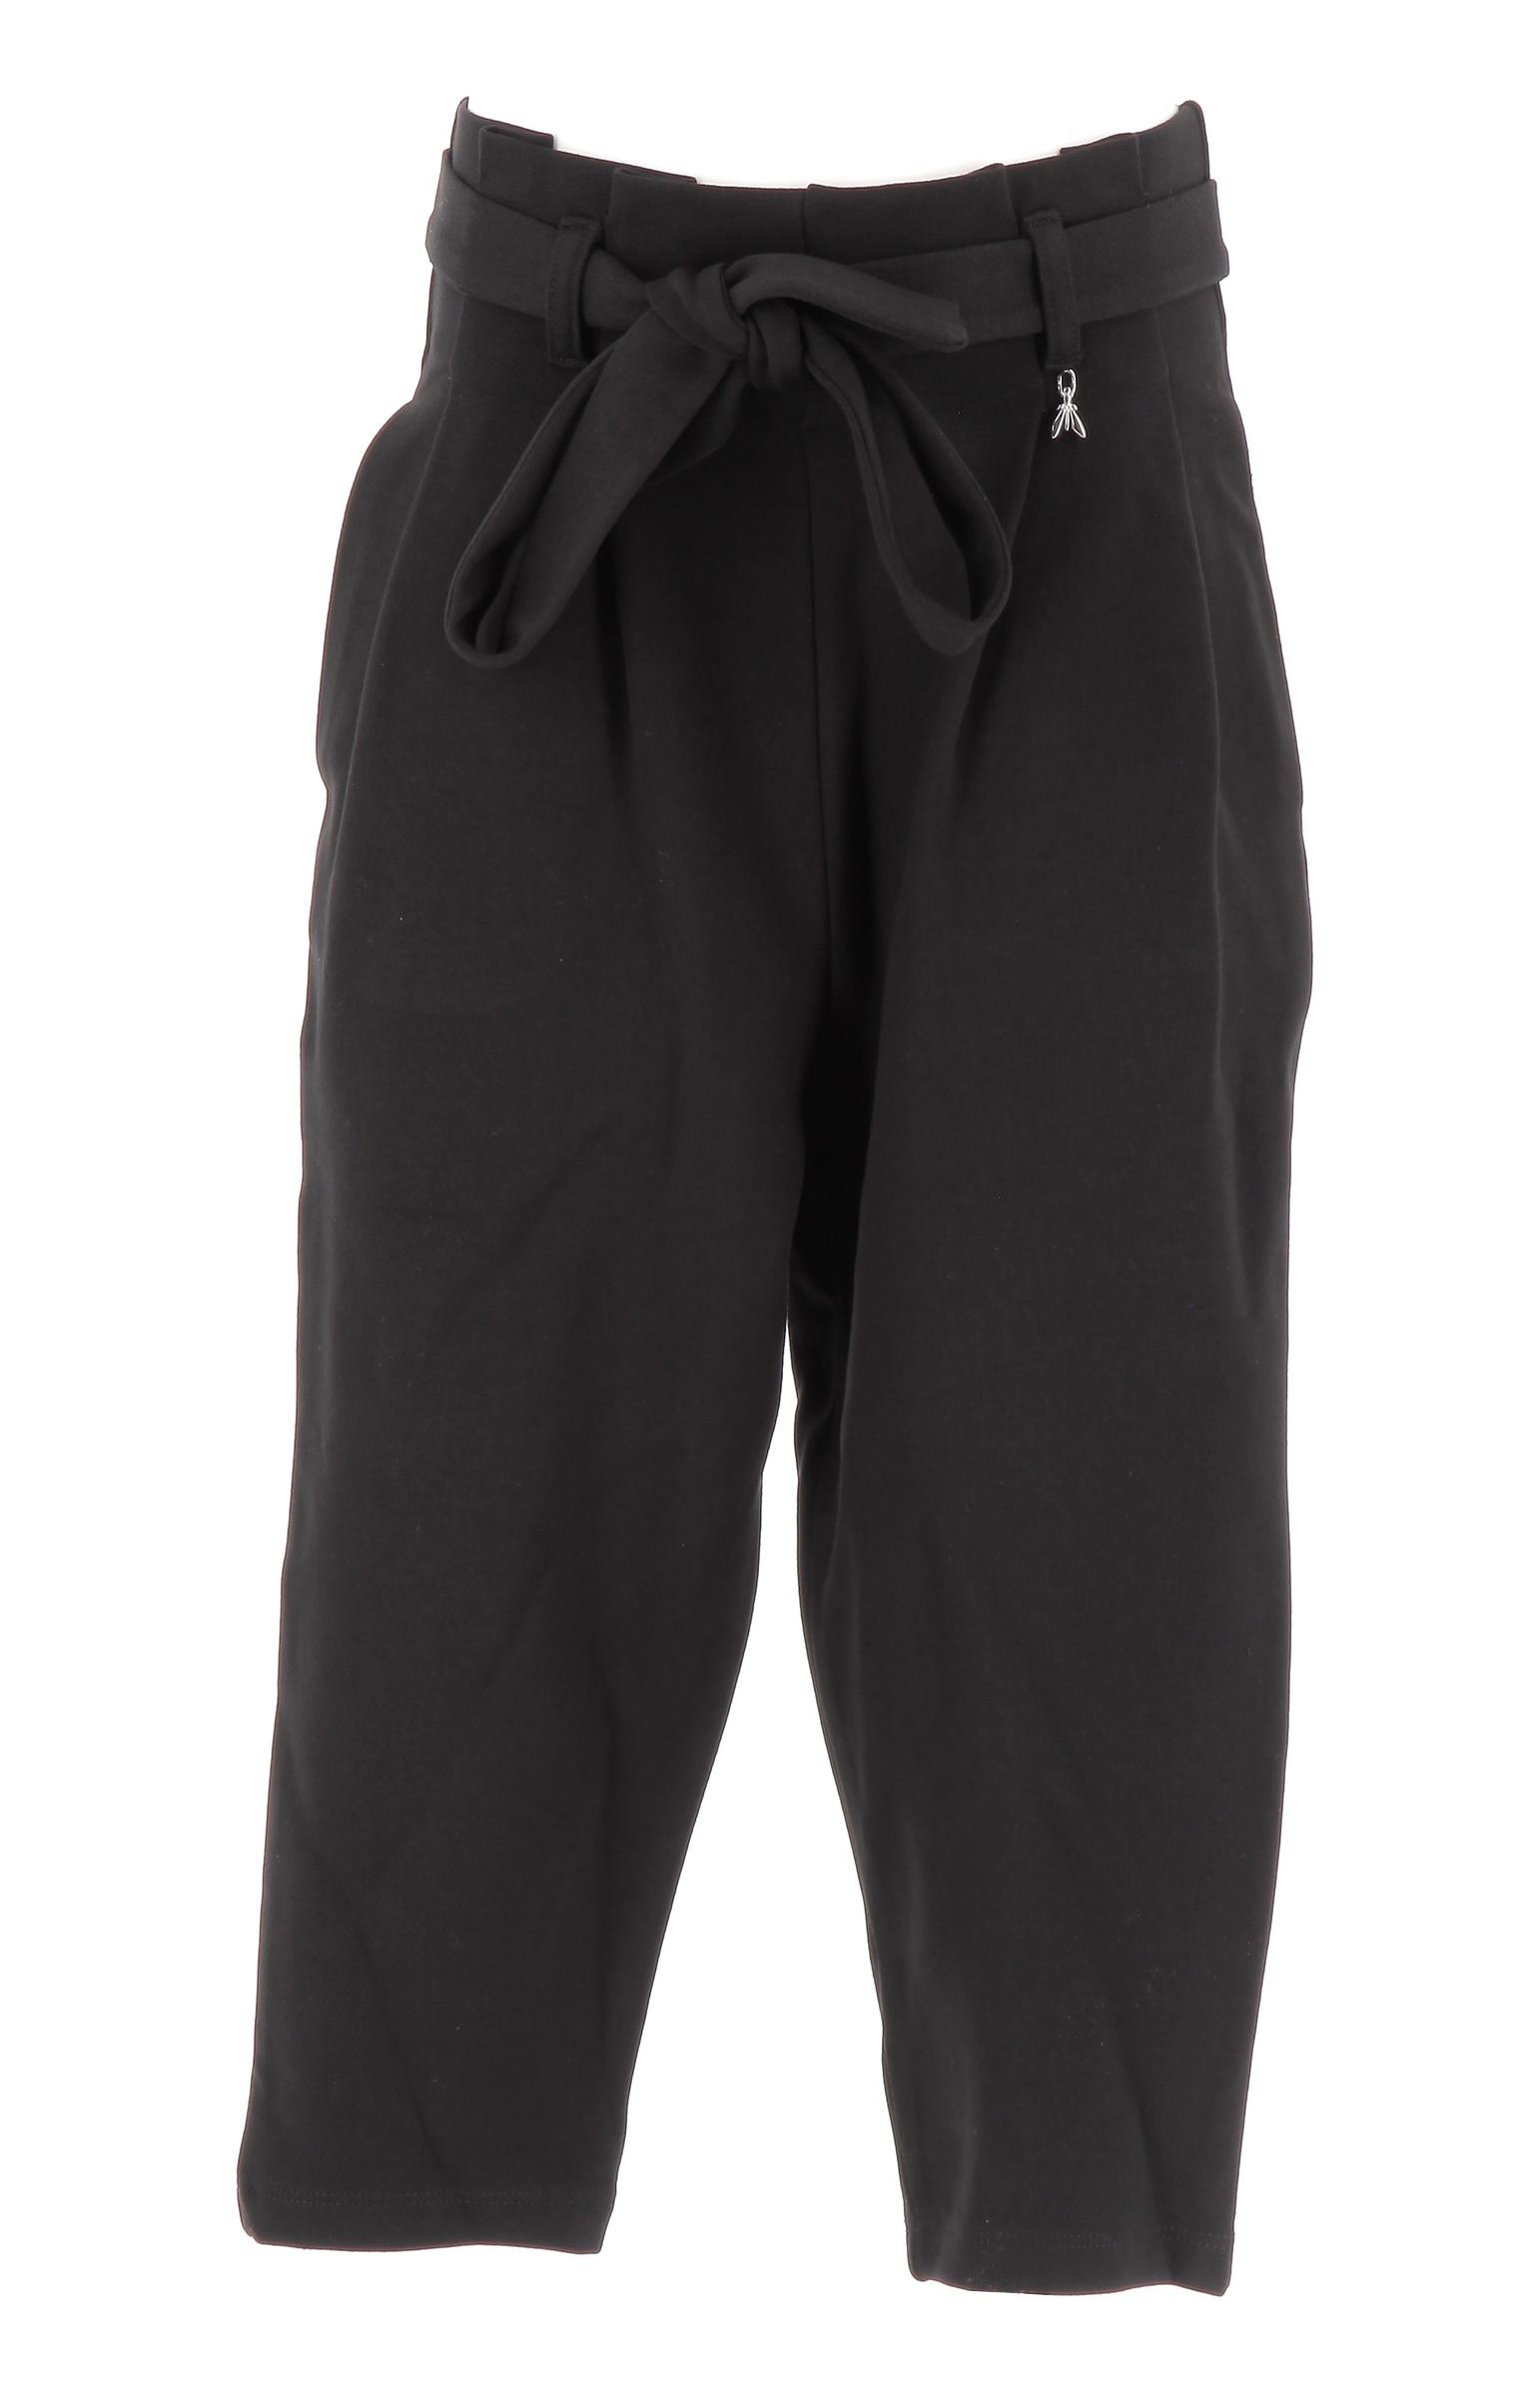 patrizia pepe trousers PATRIZIA PEPE | Pants | PJFPA0512850995